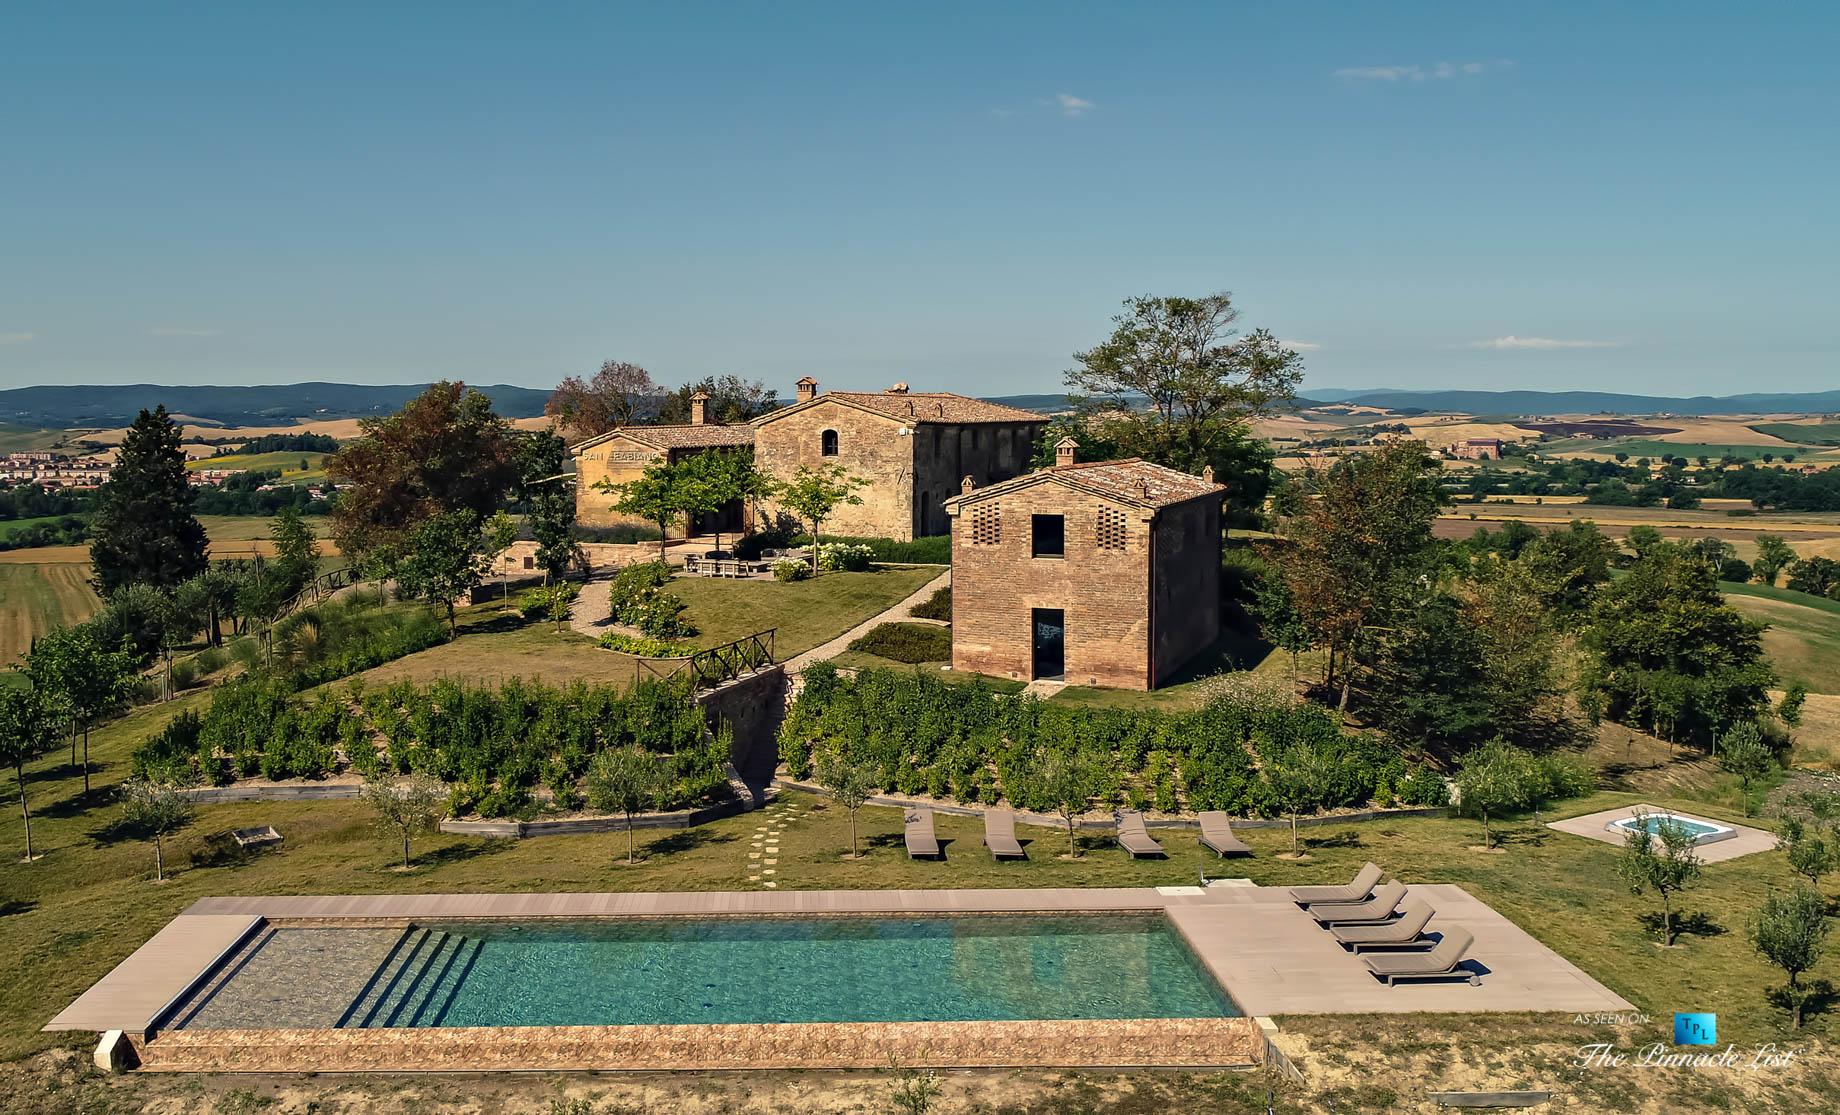 Historic Tuscan Villa – Podere Panico Estate, Monteroni d'Arbia, Siena, Tuscany, Italy – Aerial Property View